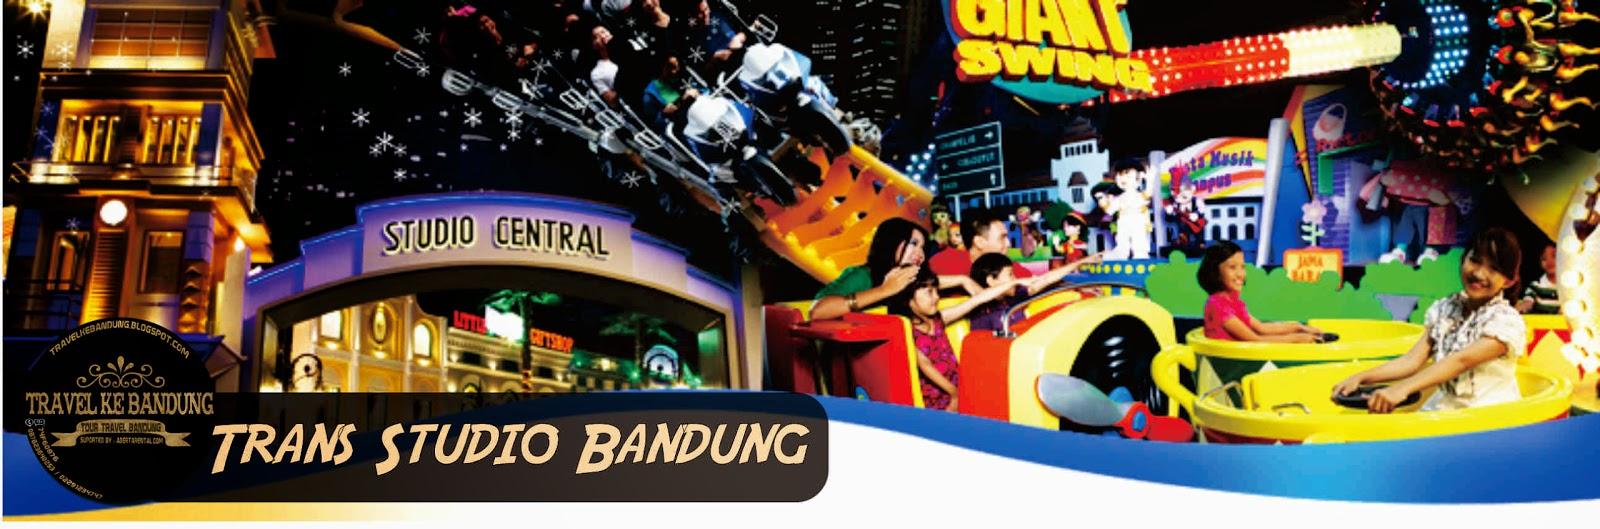 Trans Studio Bandung | Tour and Travel Bandung